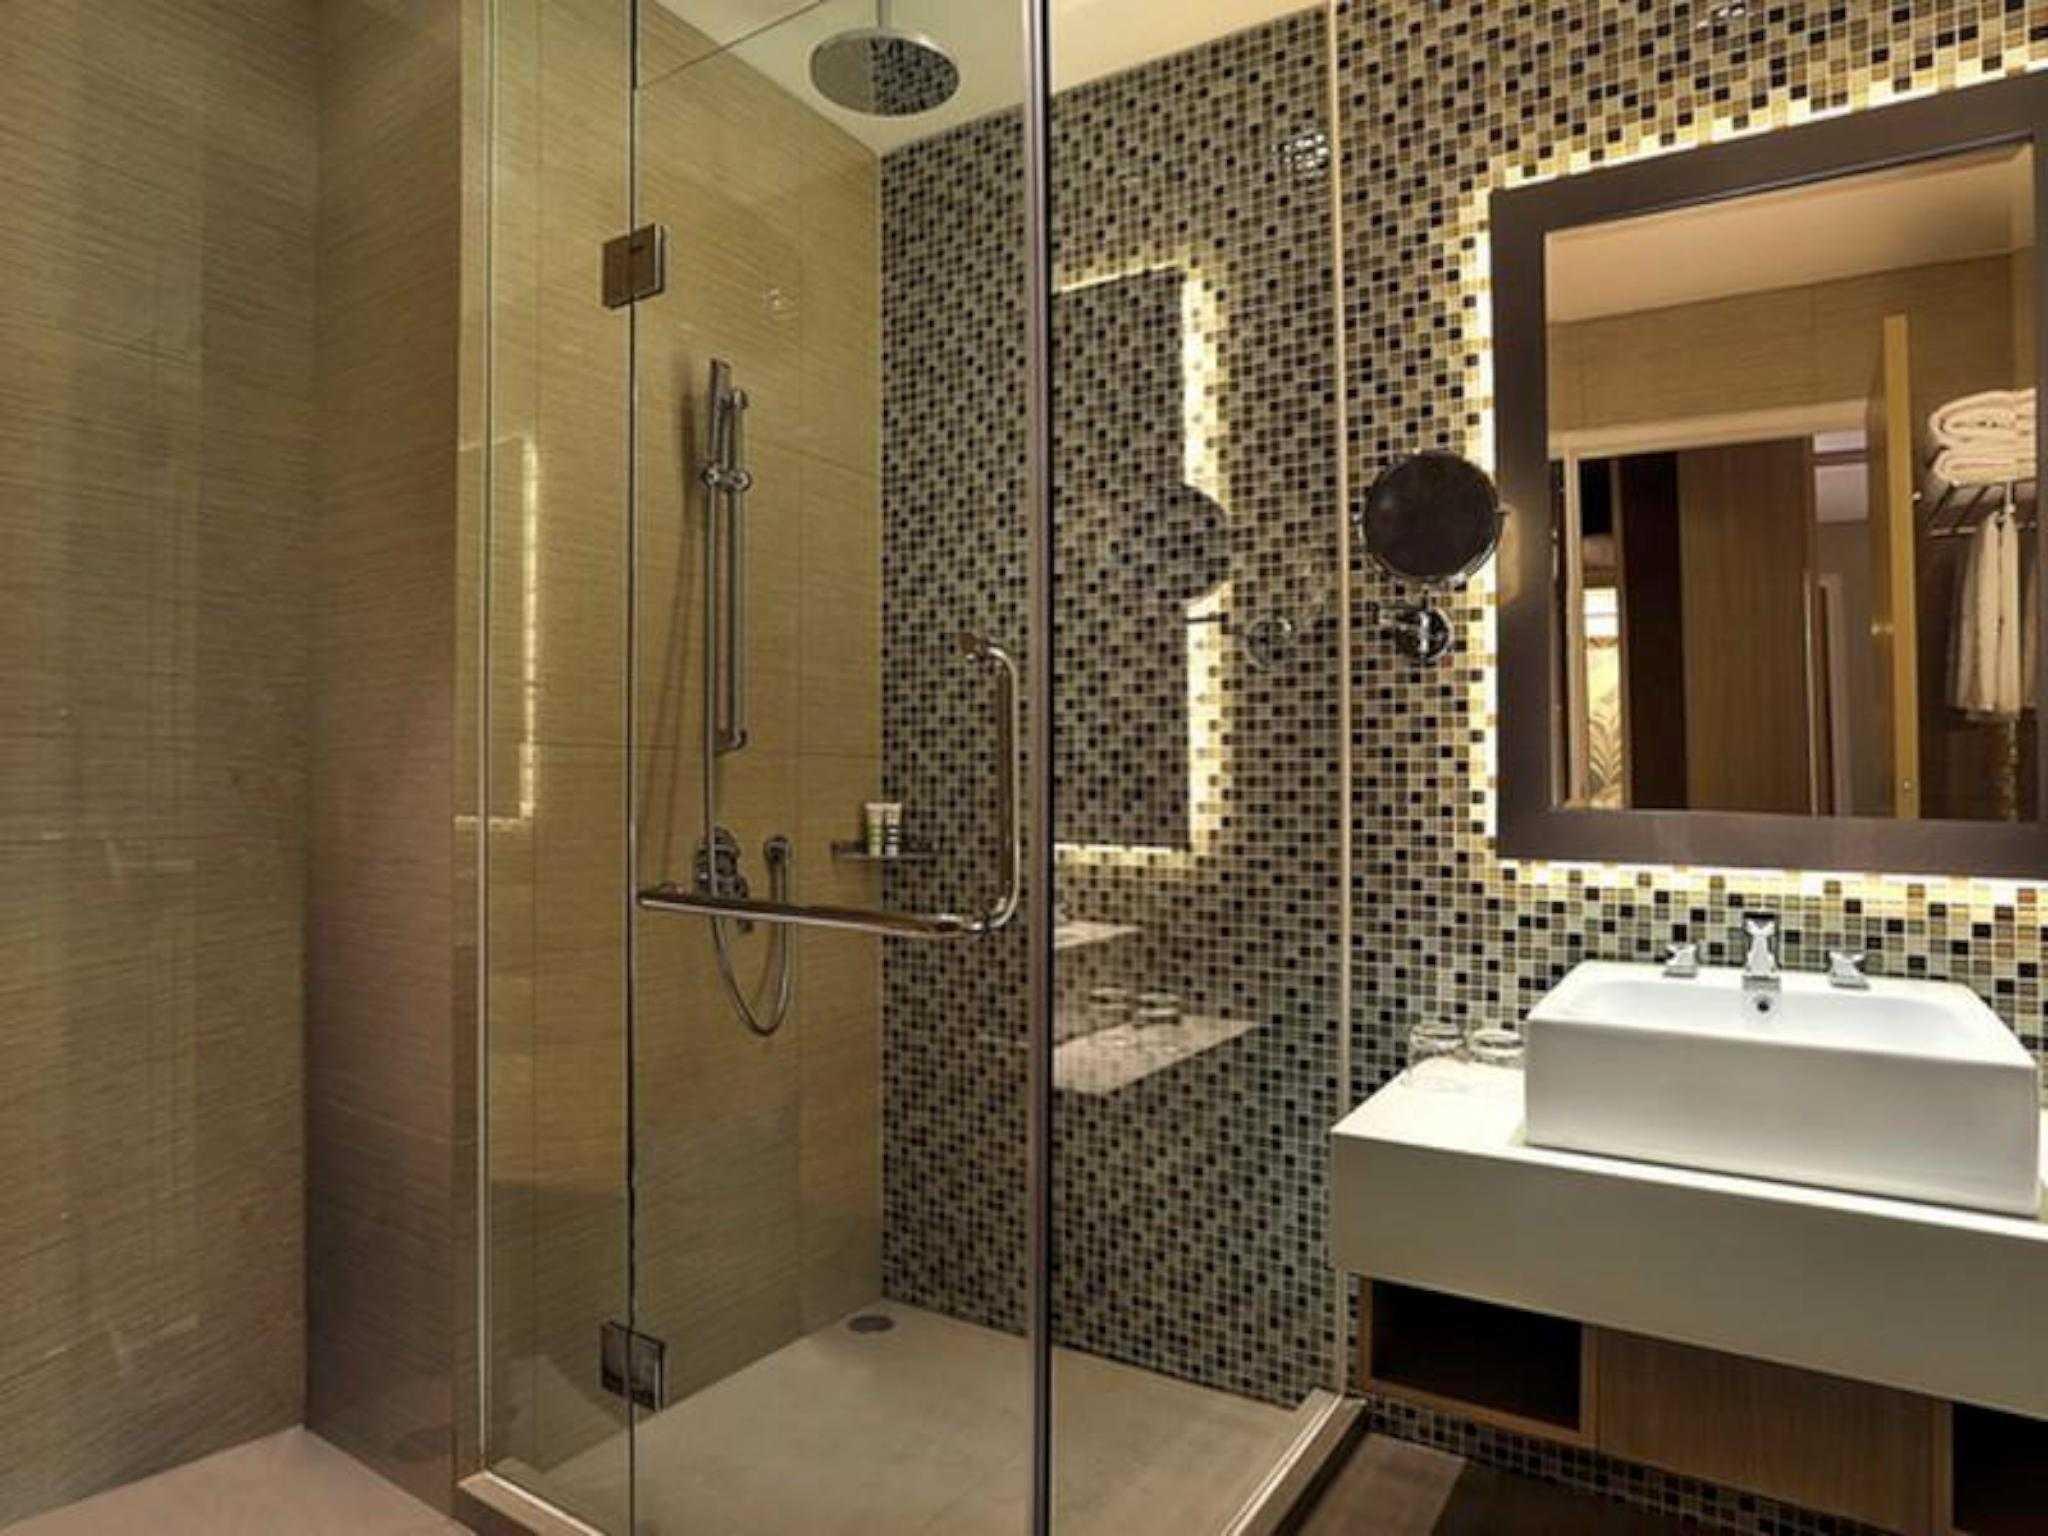 Bral Architect Mercure Hotel Setiabudi Jl. Dr. Setiabudhi No. 269 - 275, Kel. Cidadap, Kec. Sukasari, Isola, Sukasari, Kota Bandung, Jawa Barat 40154, Indonesia Setiabudi, Bandung Bathroom Tropis  24864